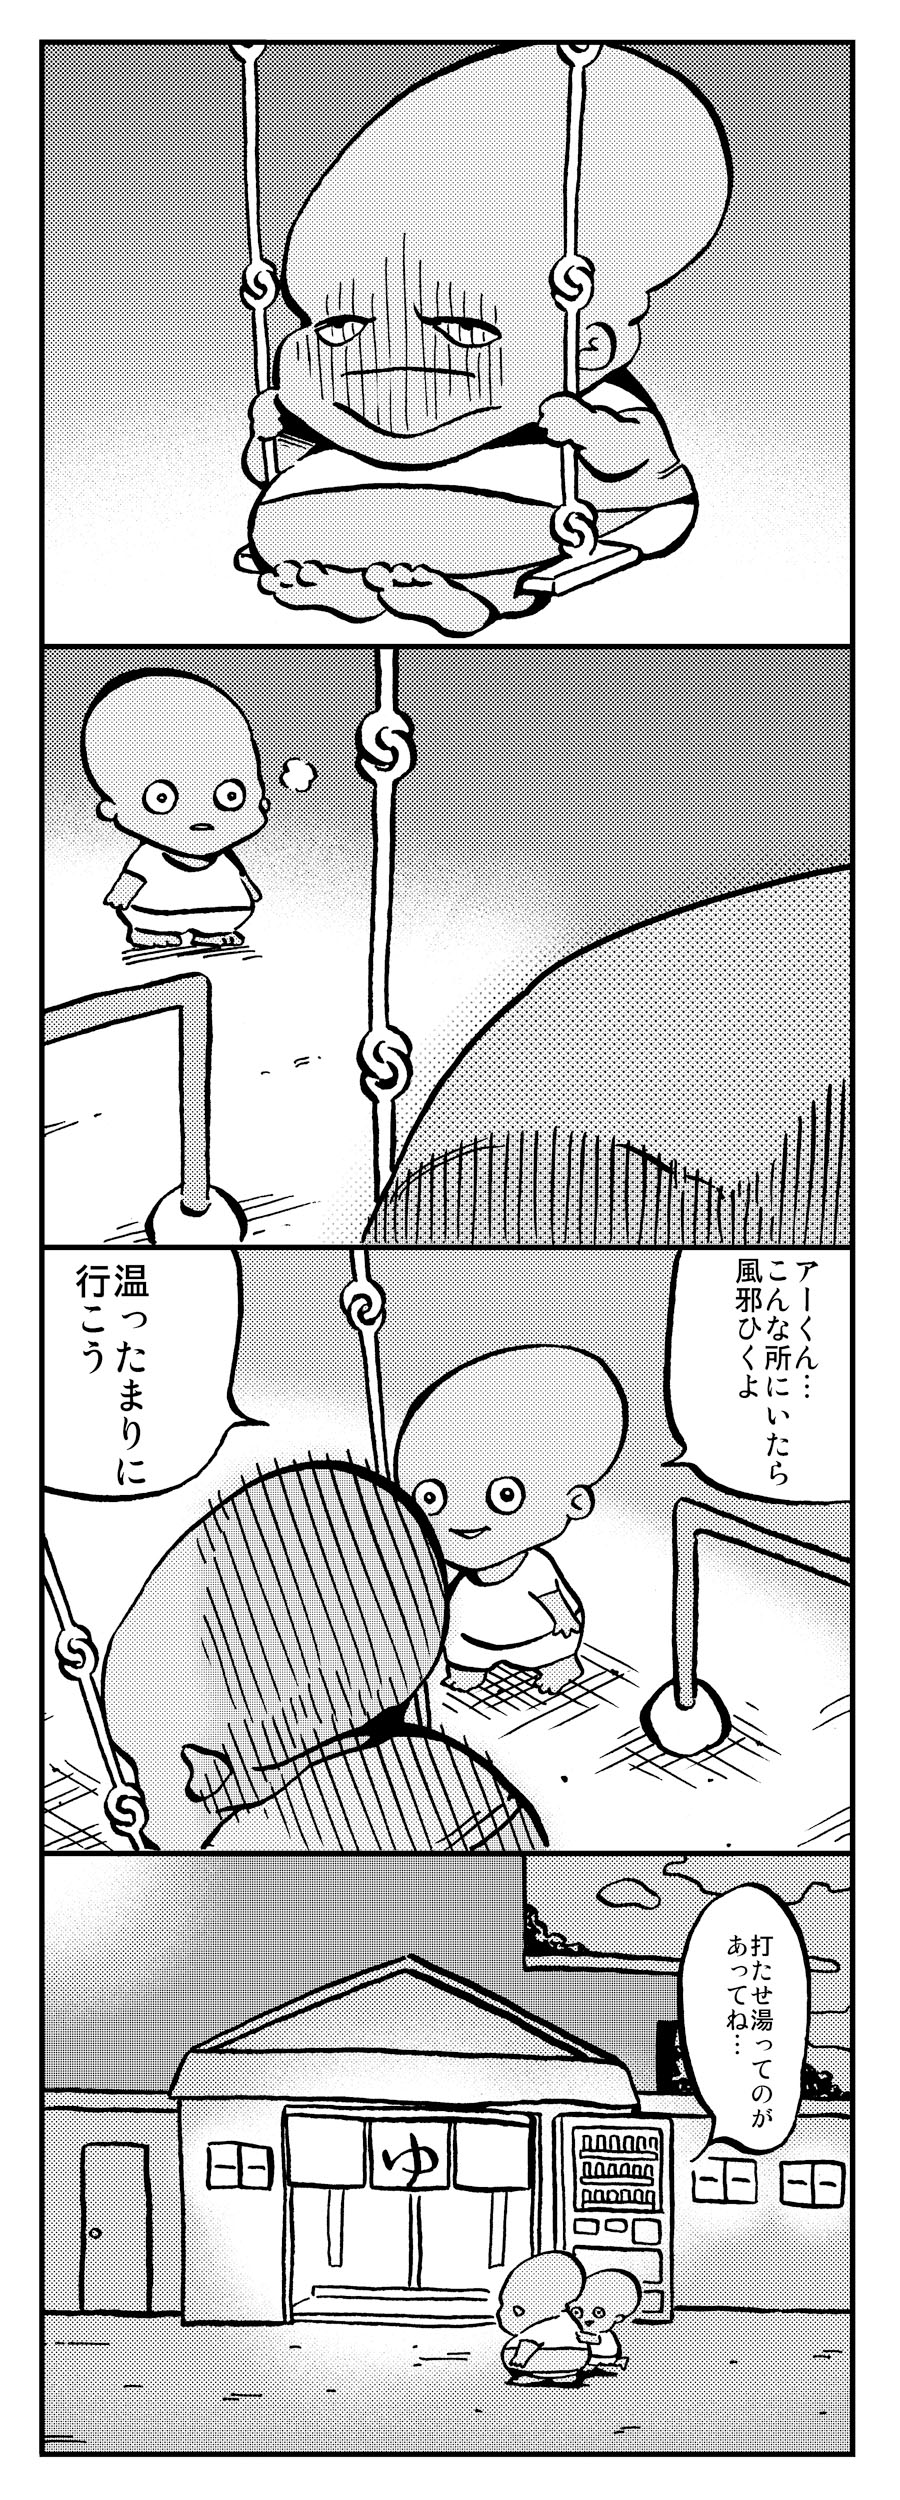 hippseijin_manga_02_04